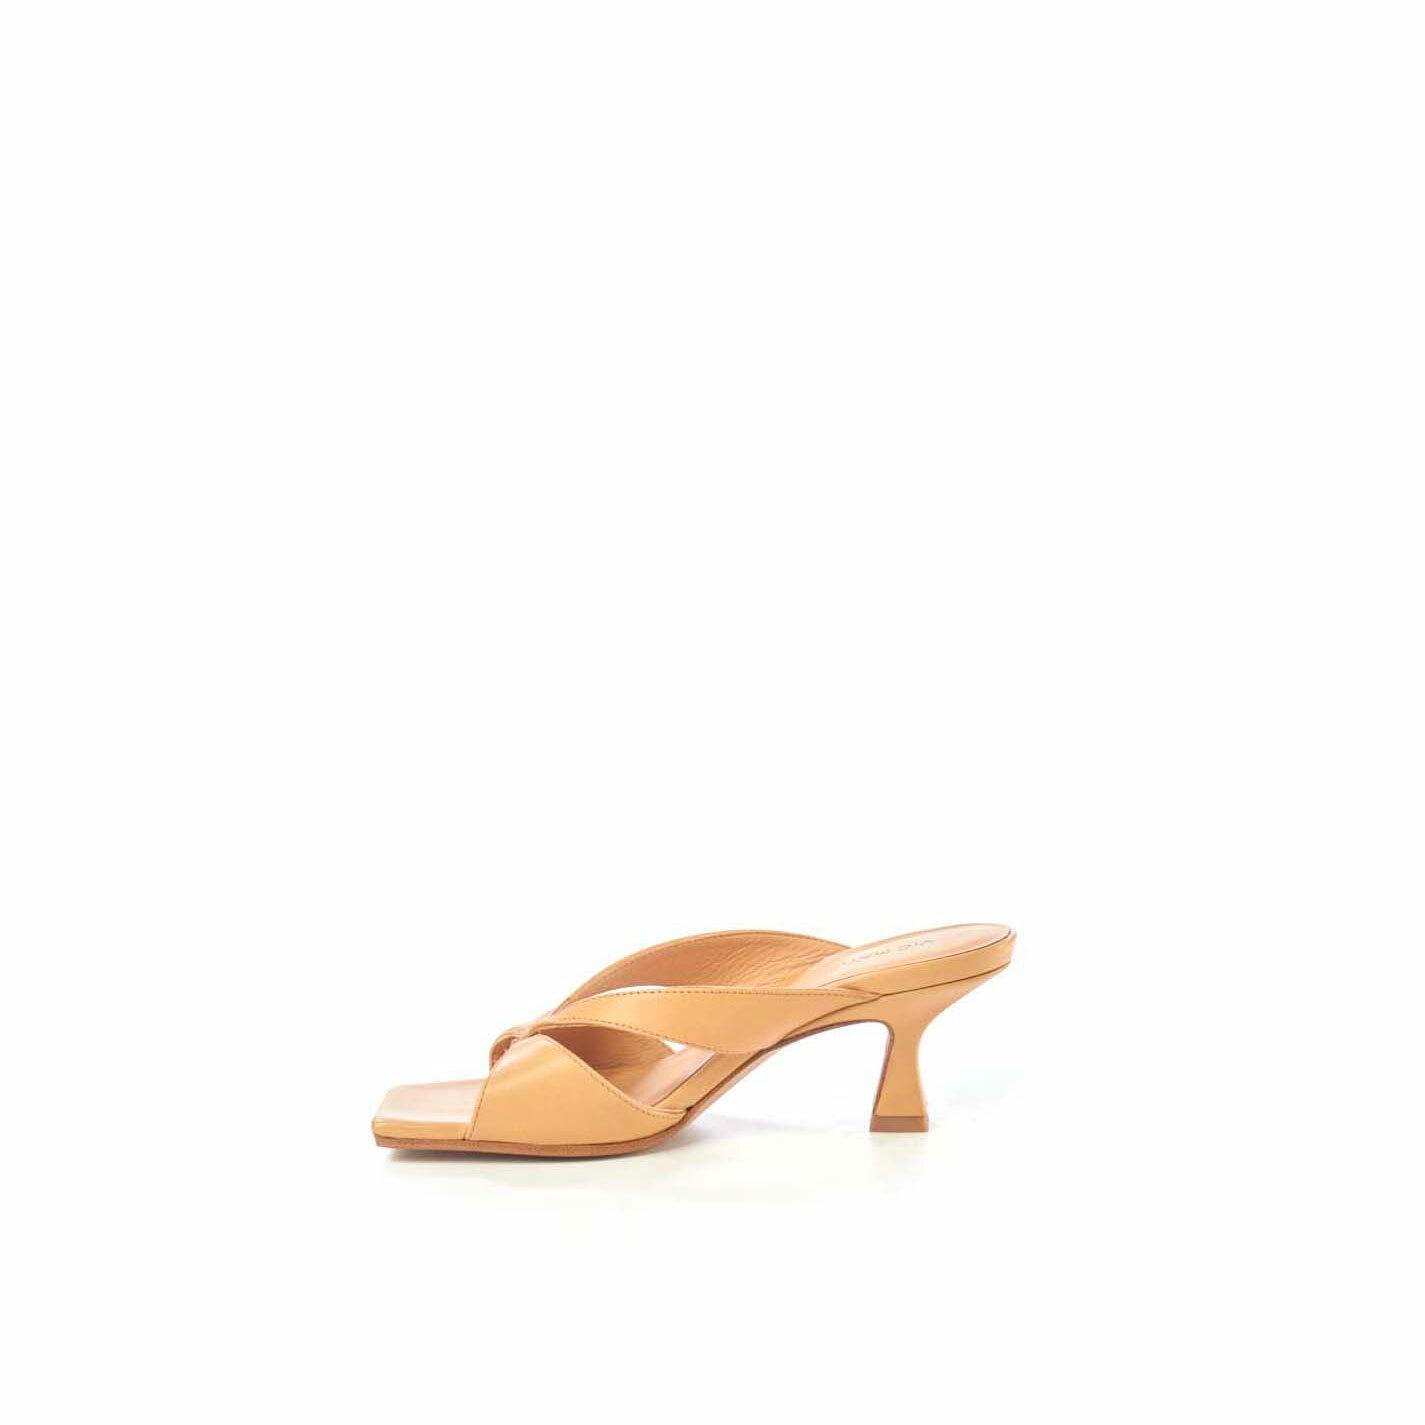 Tan-brown sandals with spool heel